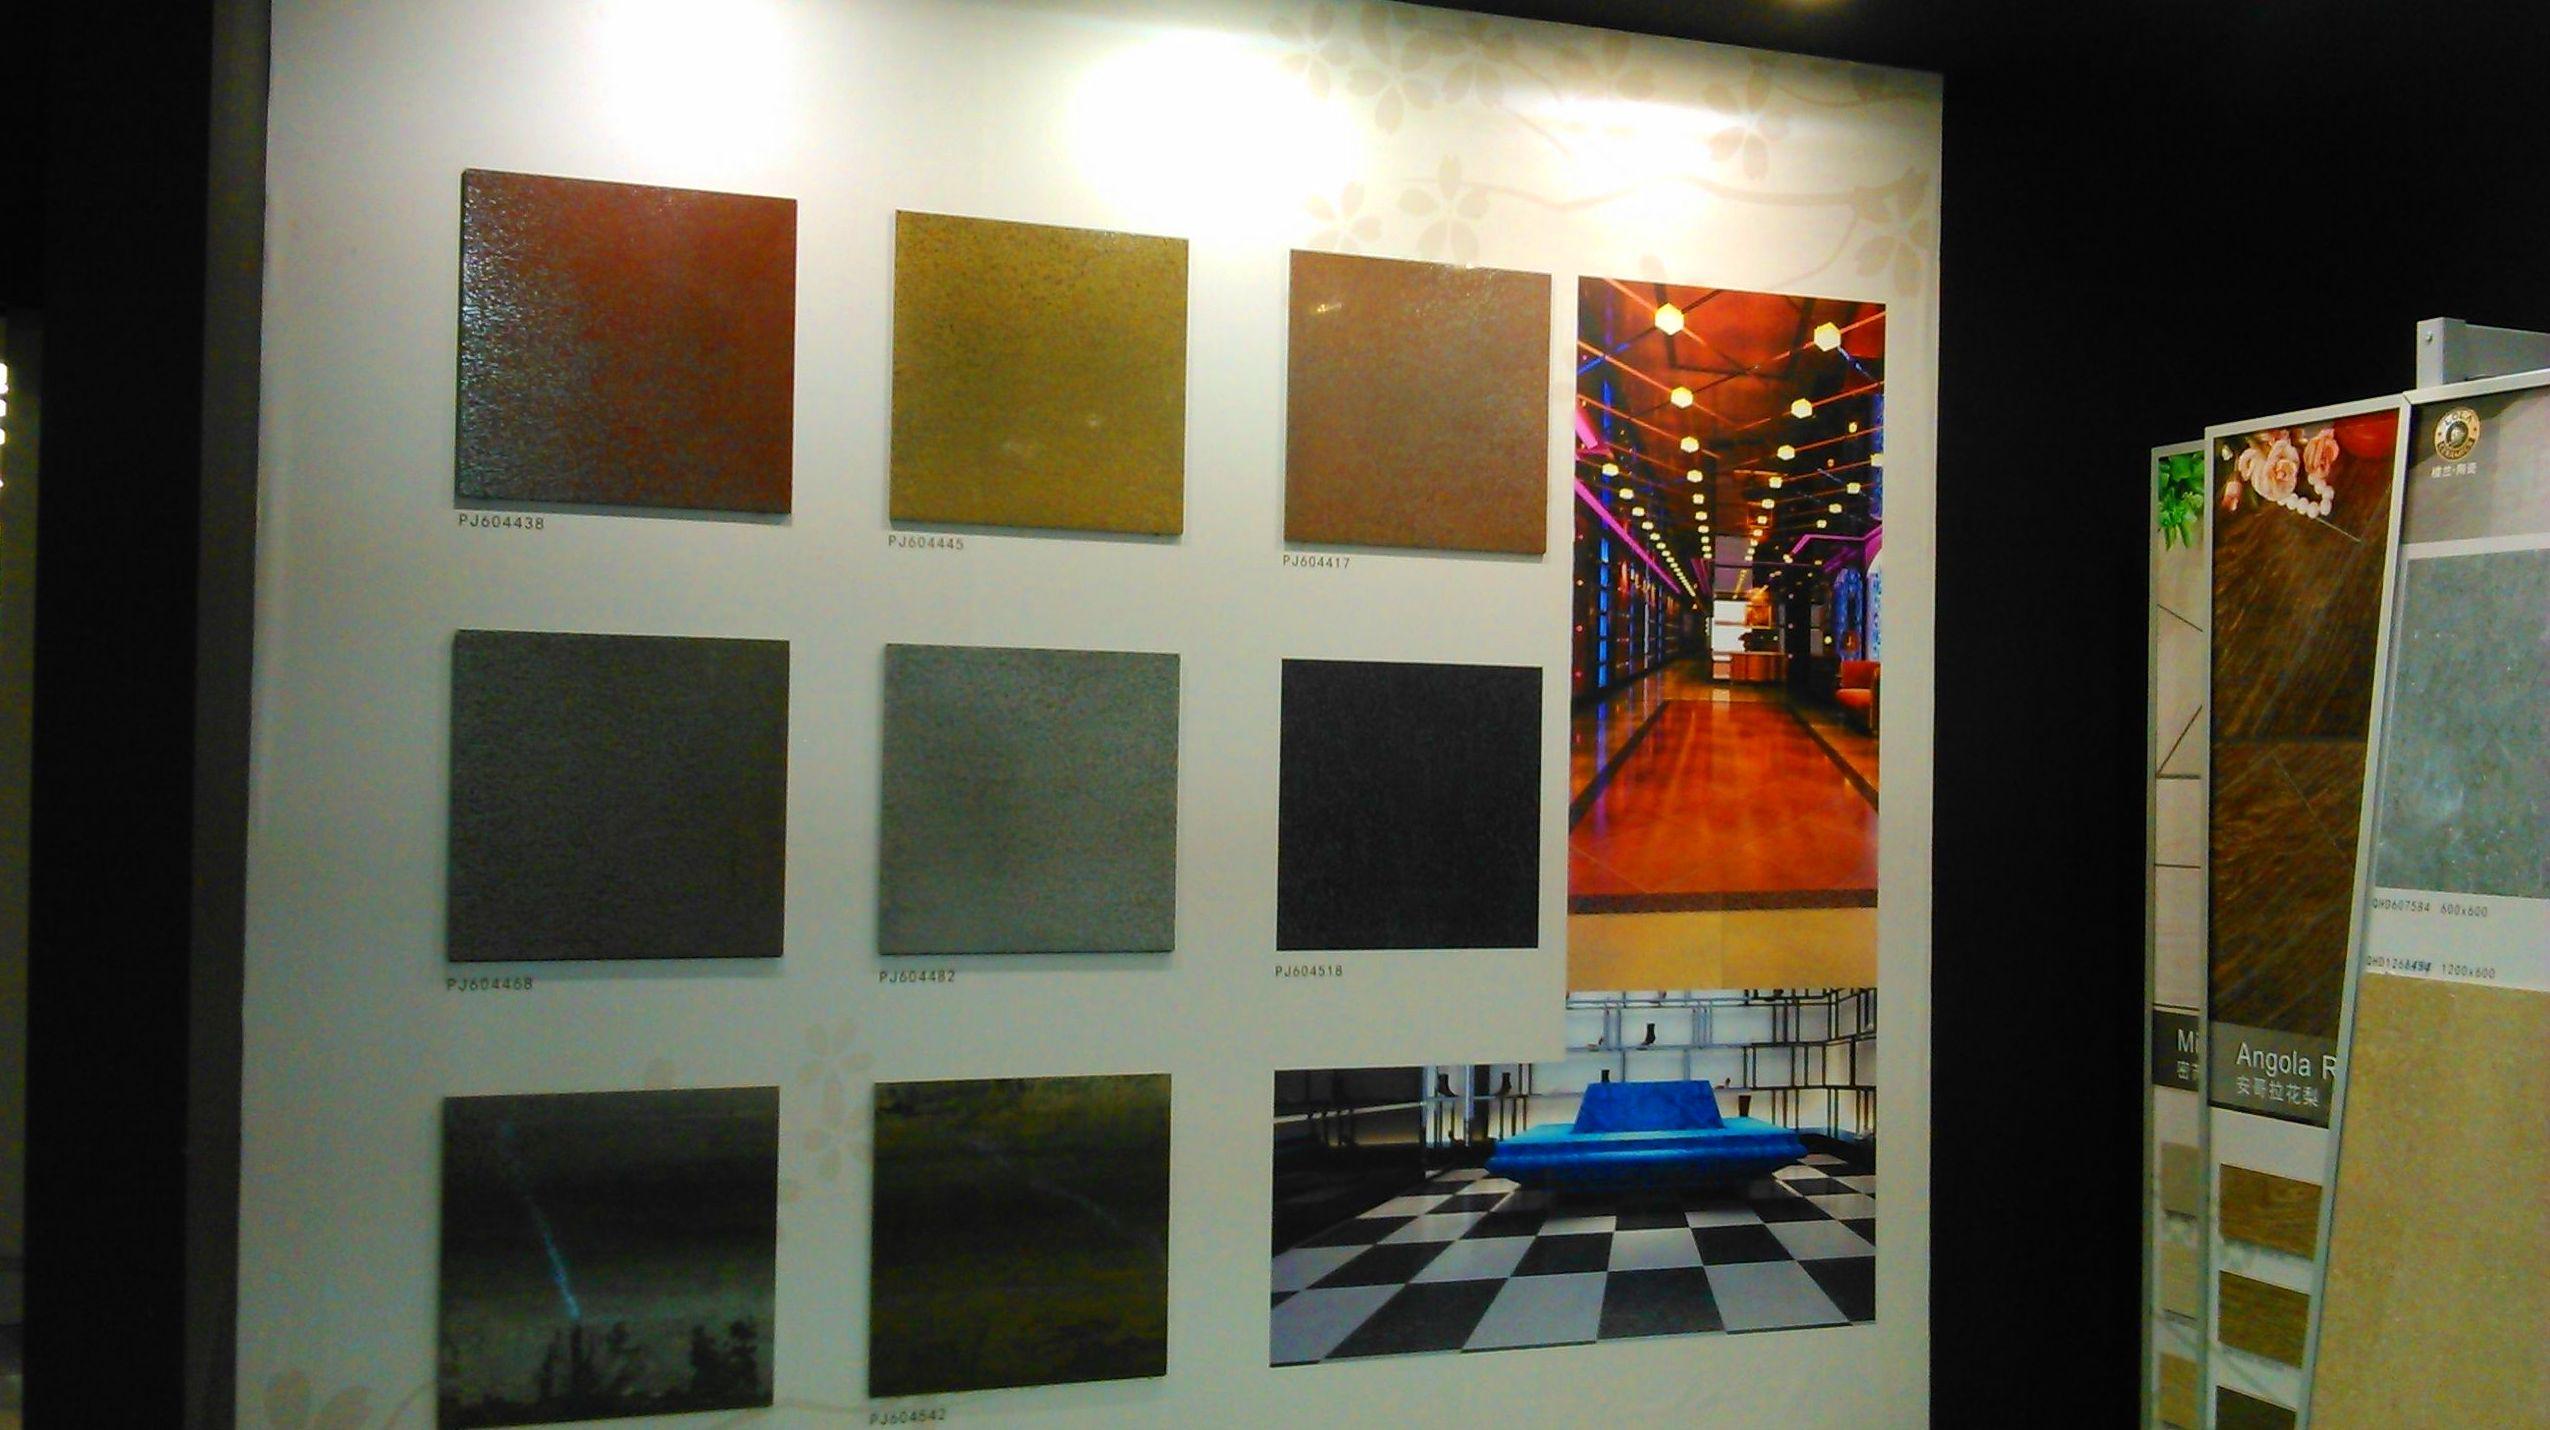 impresión digital cevisama 2015